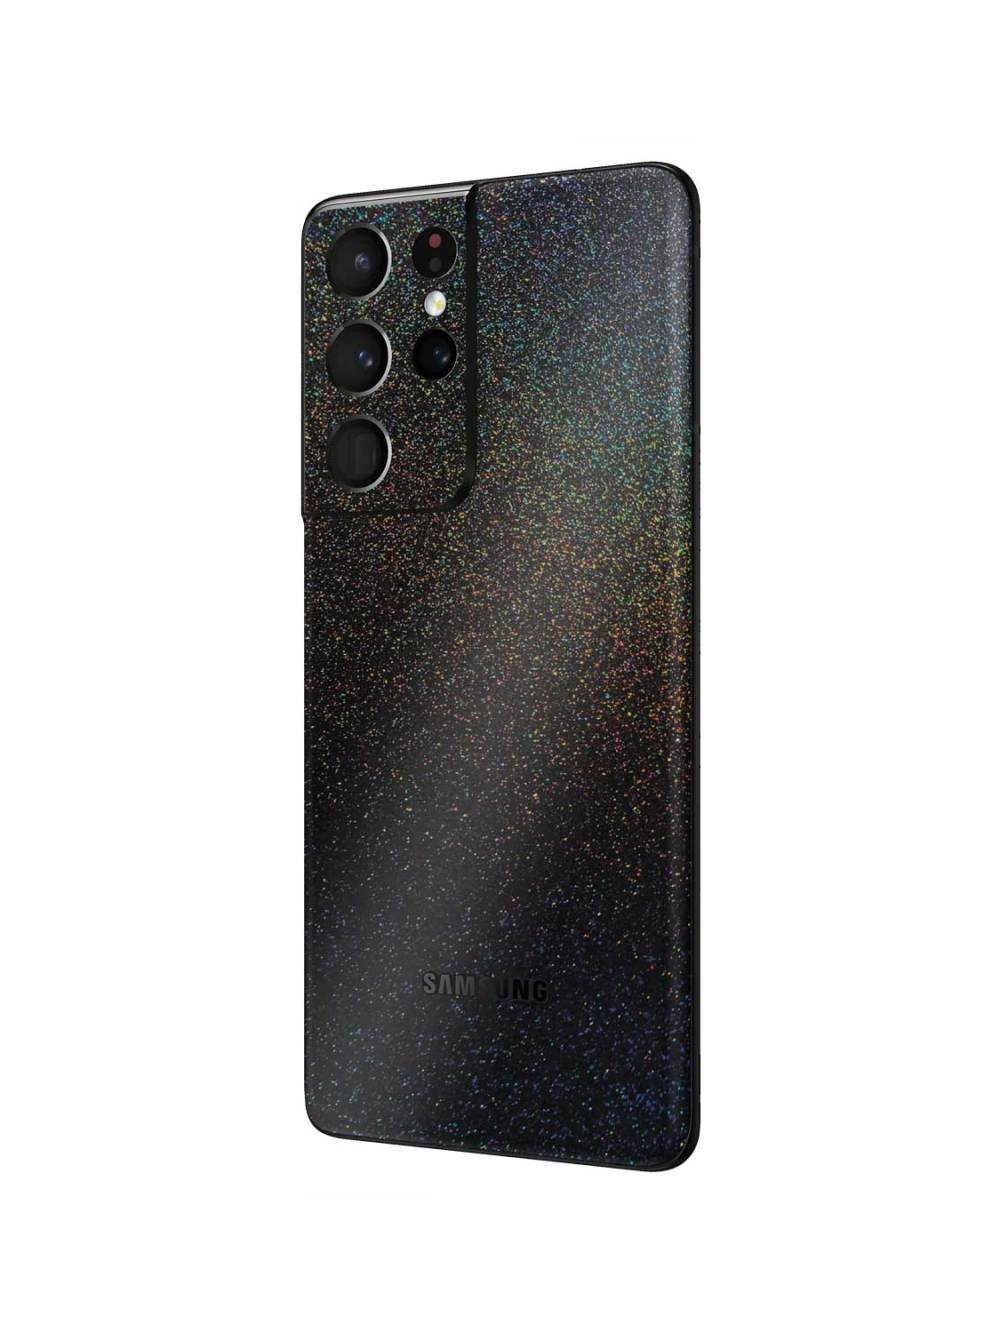 Gloss Cosmic Morpheus Black Skin Wrap for Samsung Galaxy S21 Ultra